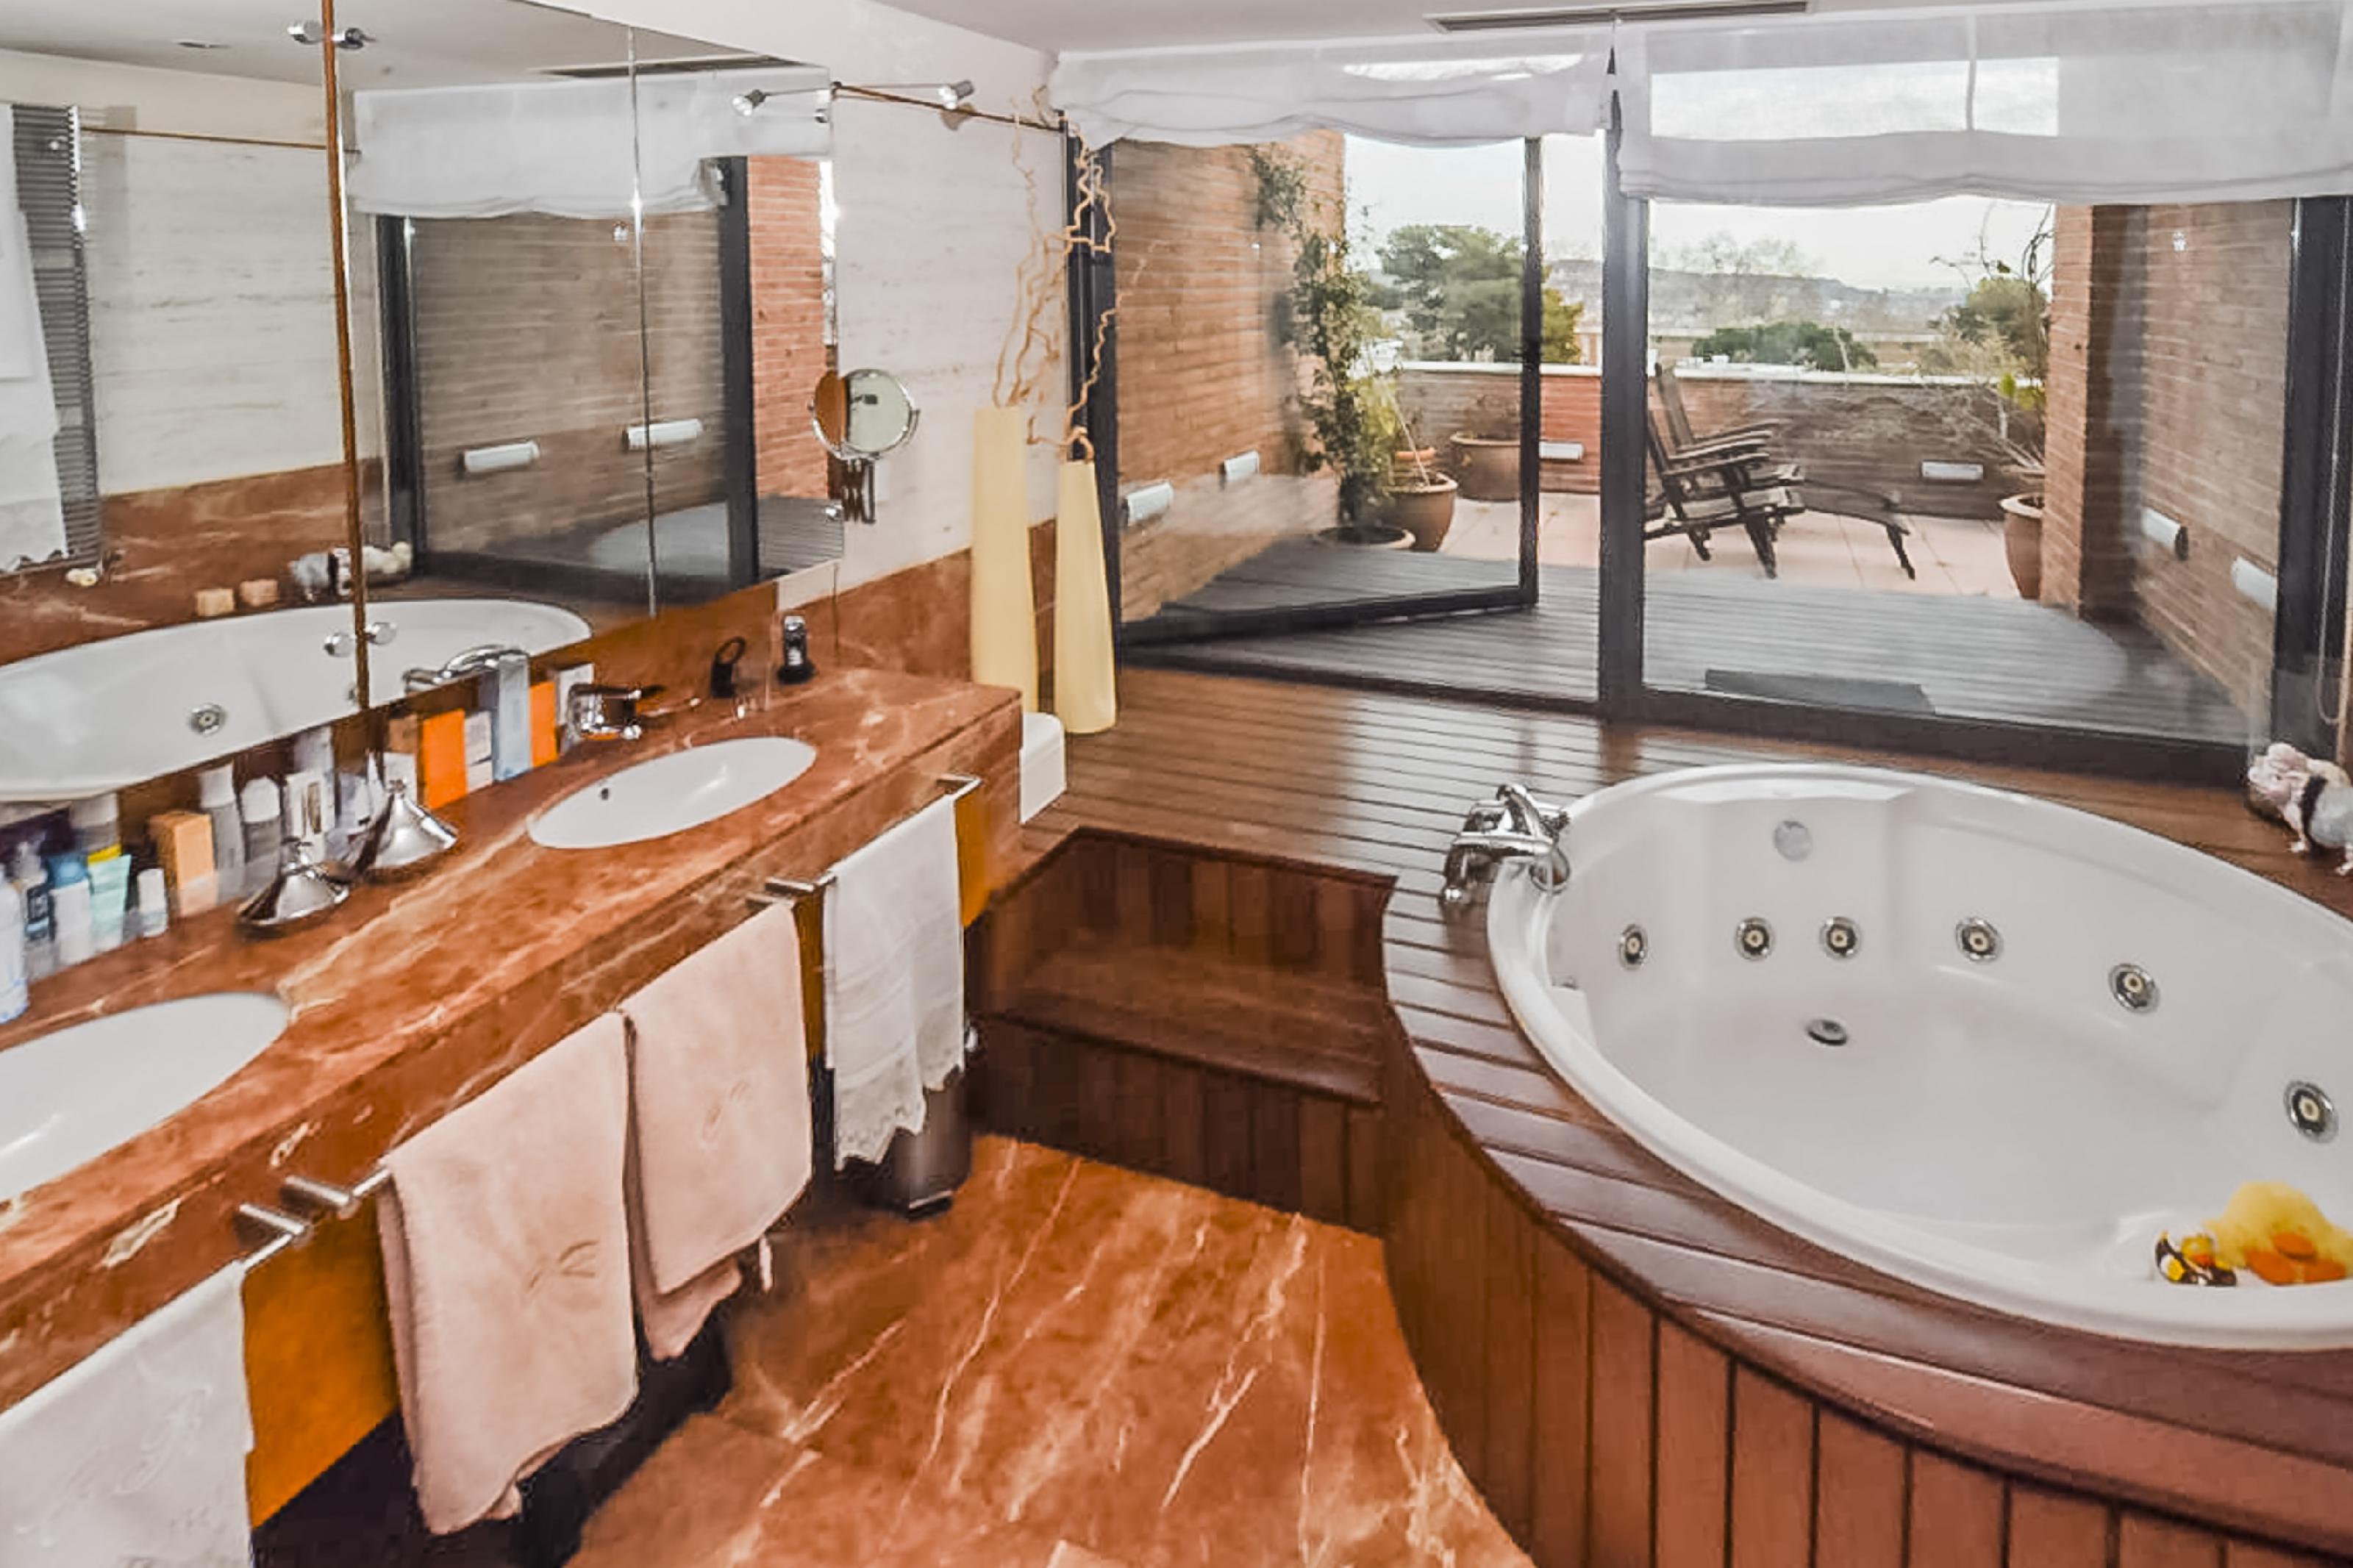 214424 Casa en venta en Les Corts, Pedralbes 3